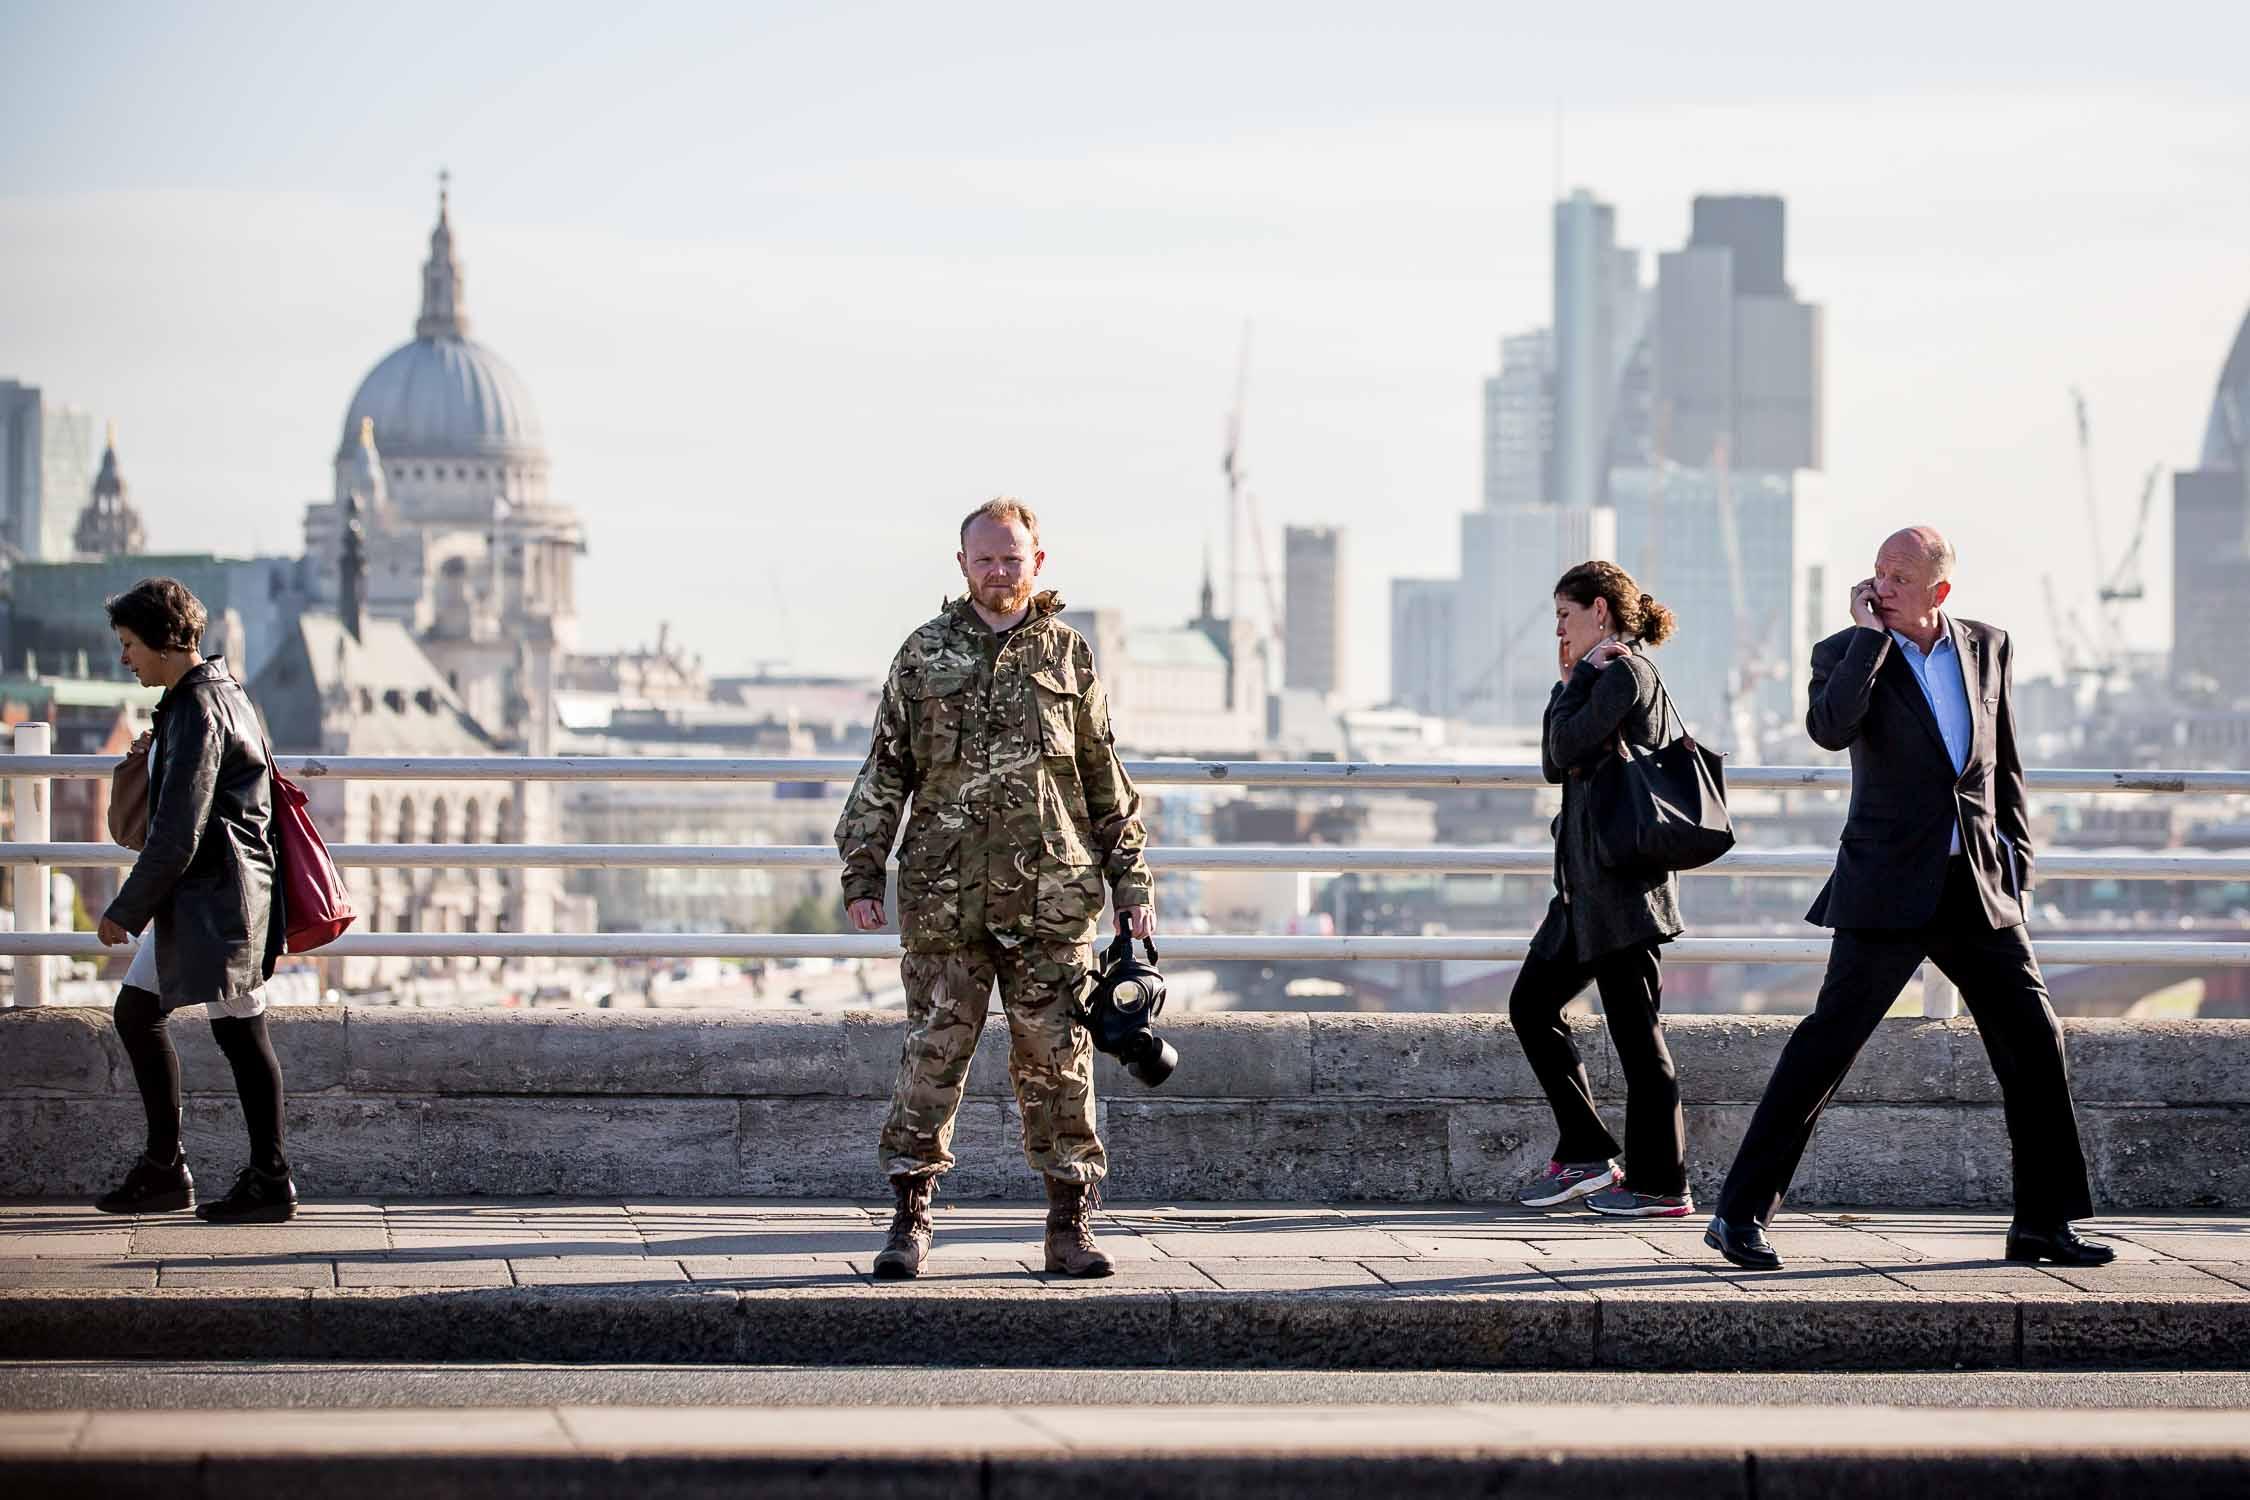 London Commercial Photographer